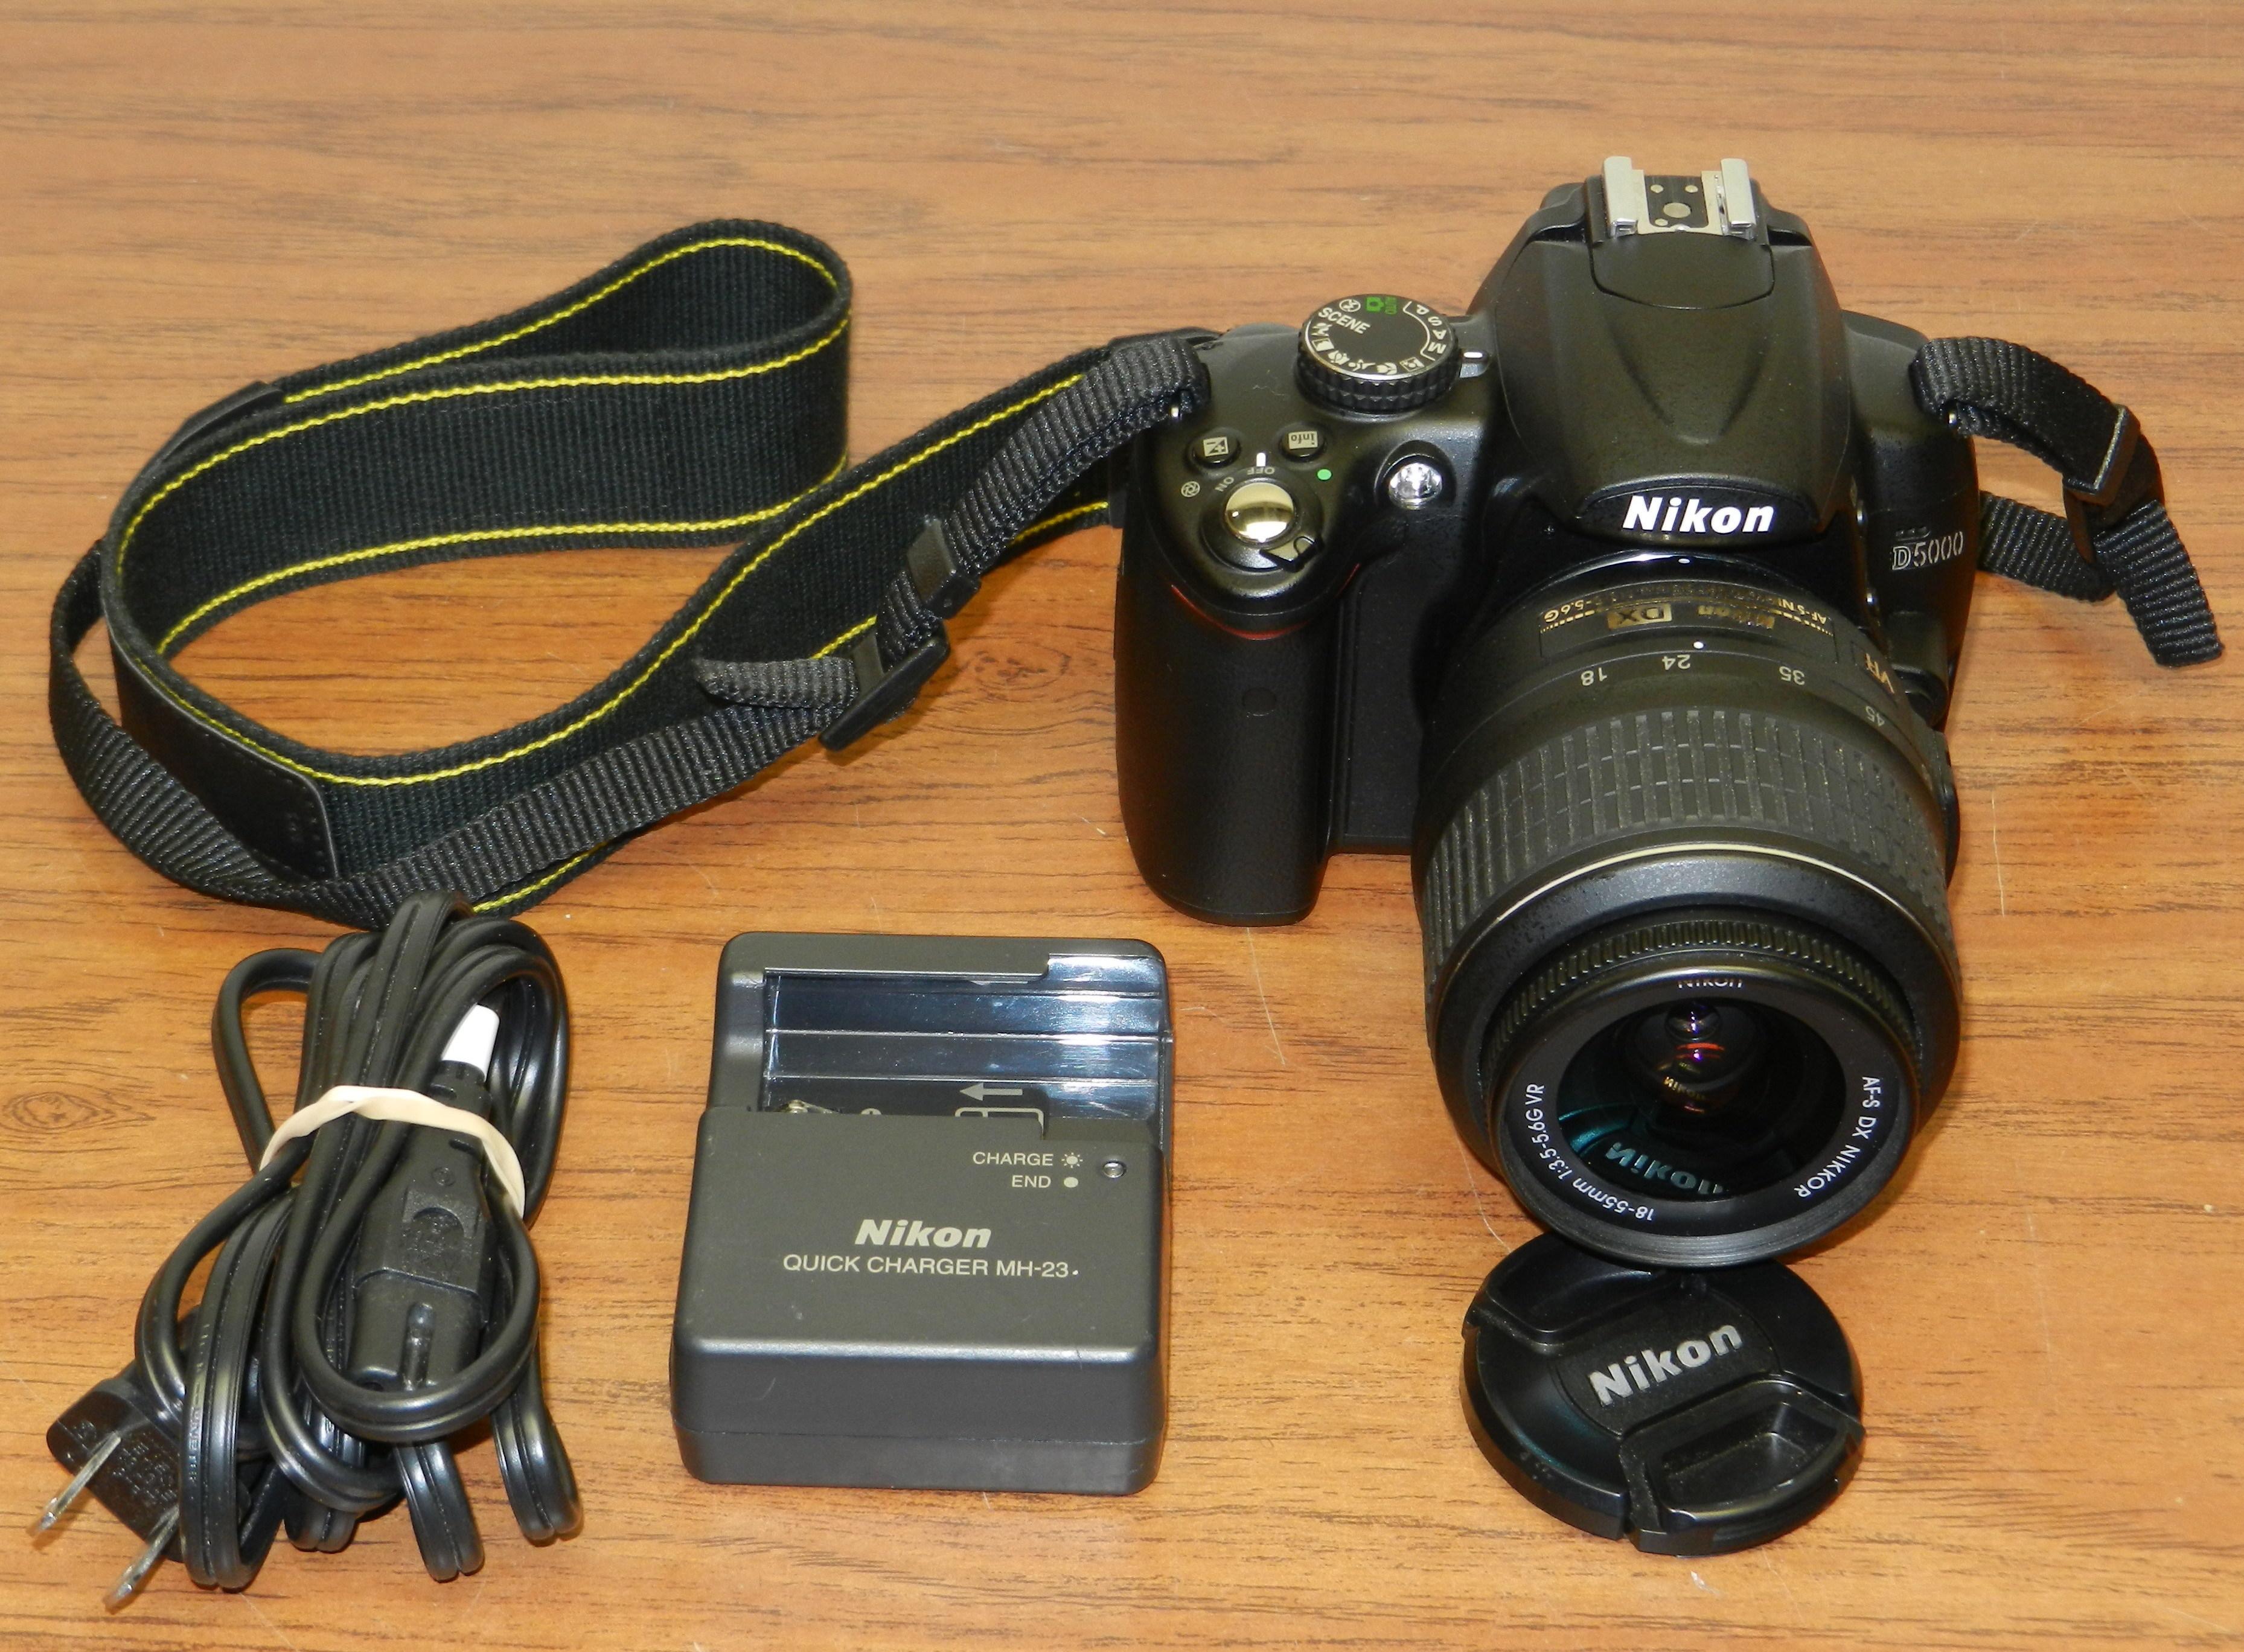 Nikon D5000 12.3MP Digital SLR Camera w/ DX 18-55mm Lens